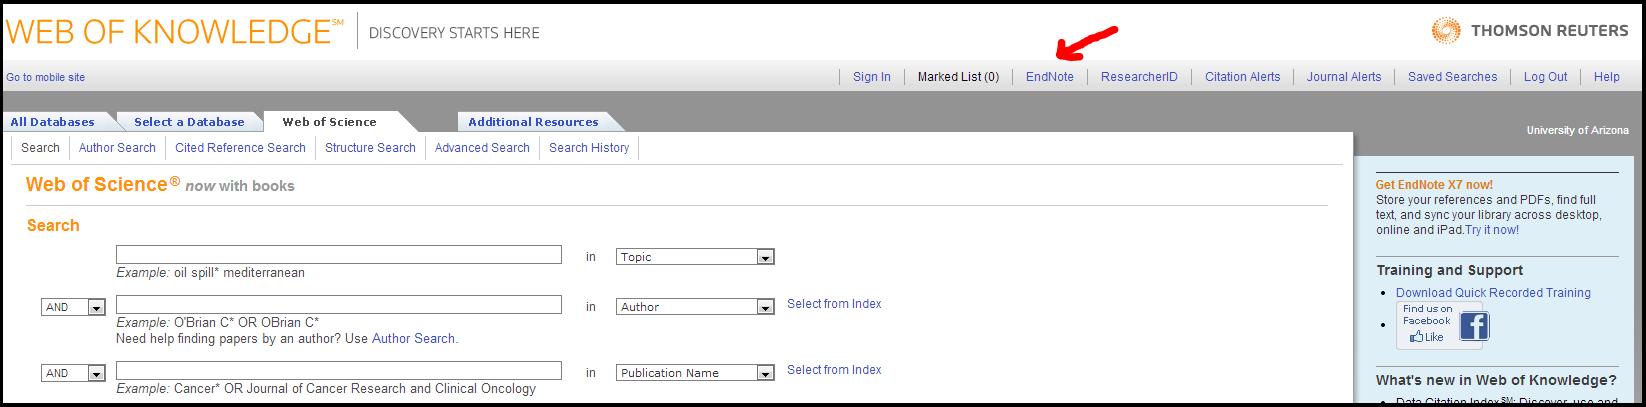 Web of Knowledge Screenshot